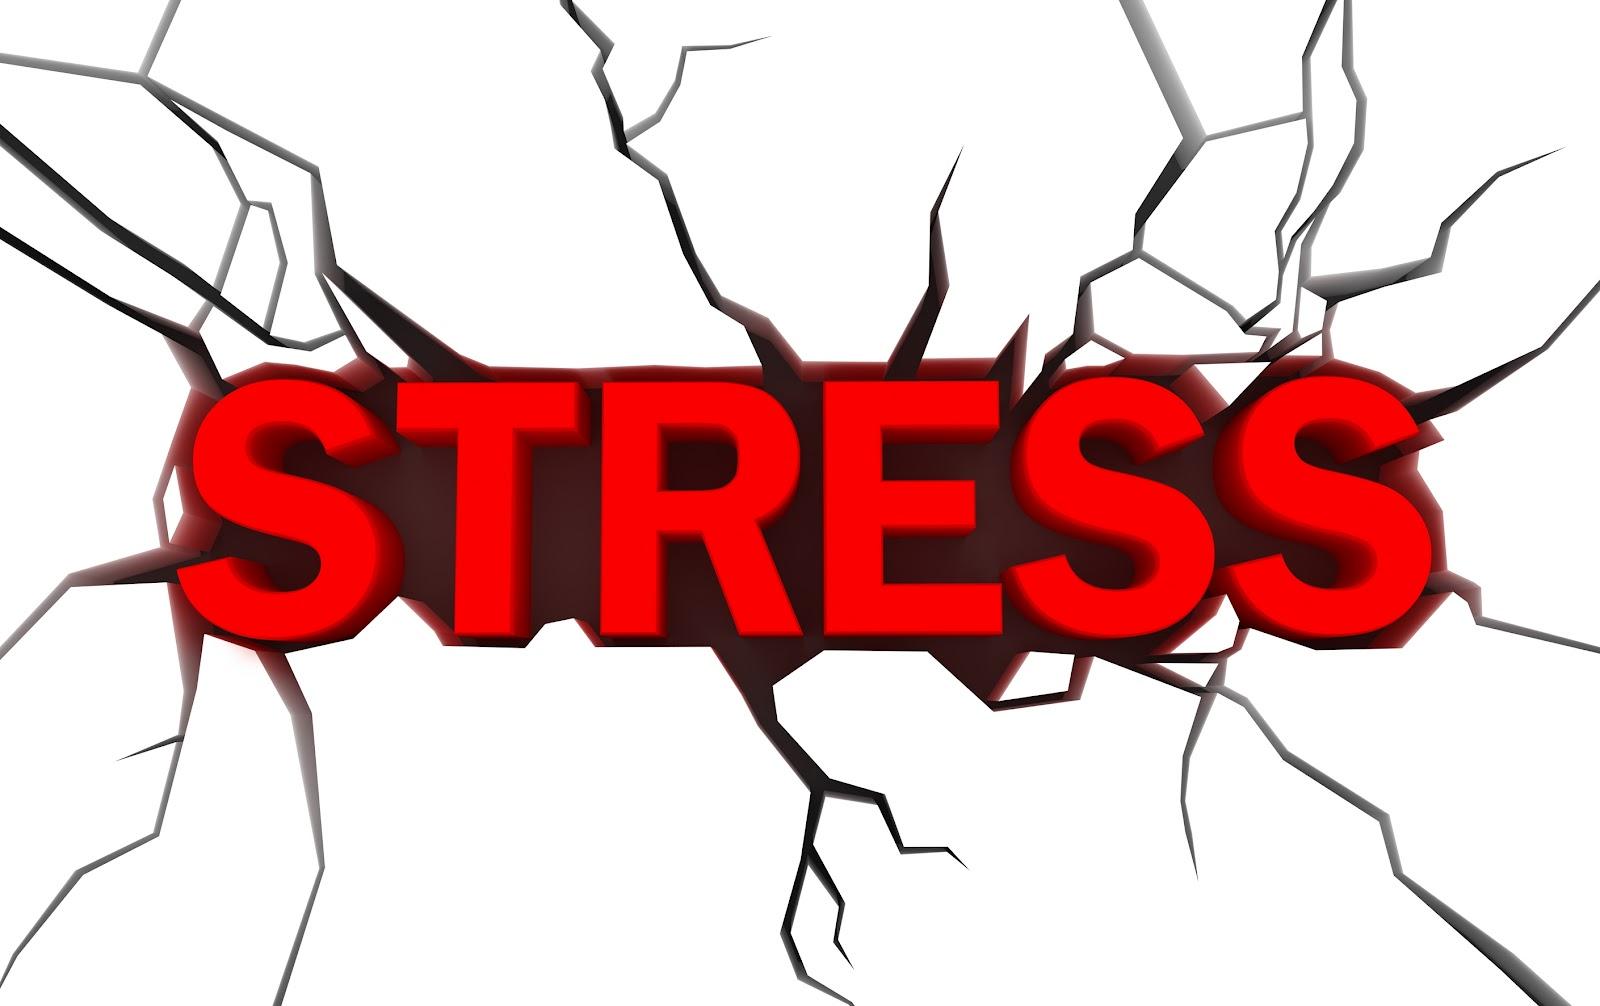 Life Stress Clip Art free image.